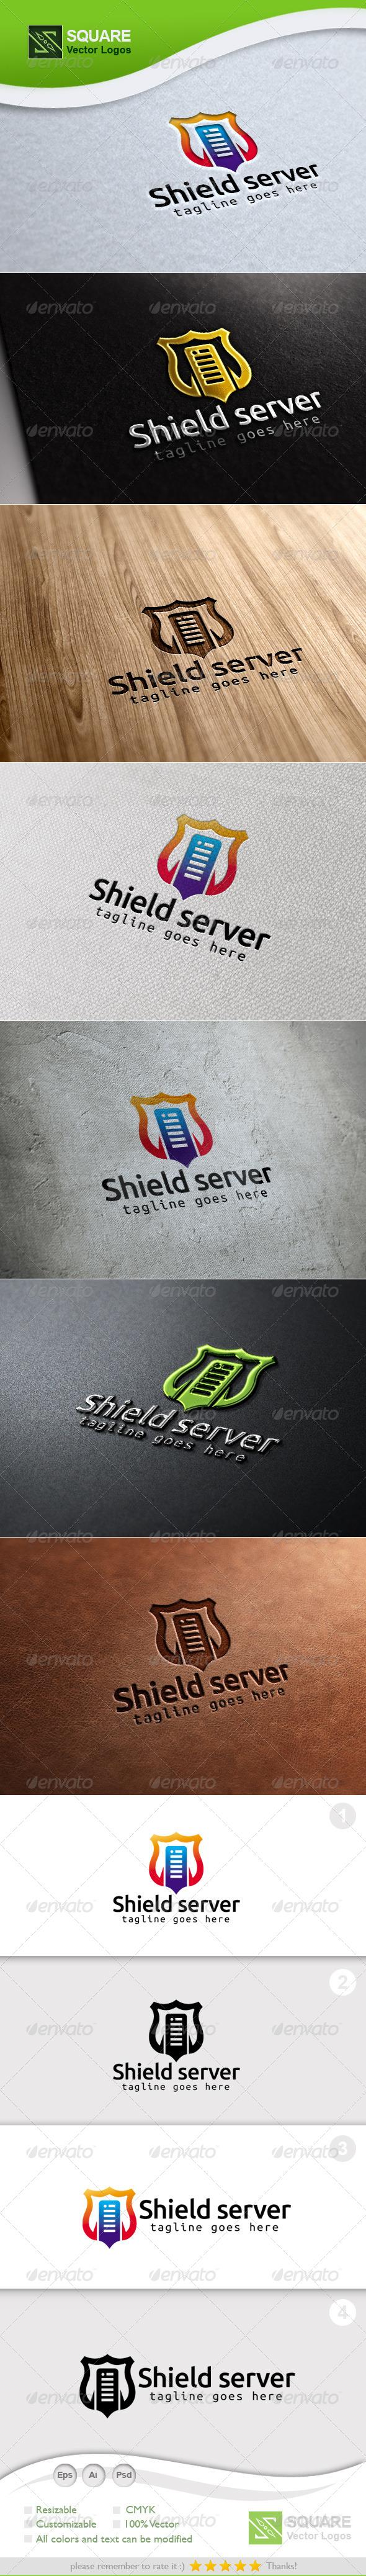 GraphicRiver Shield Server Vector Logo Template 7161102